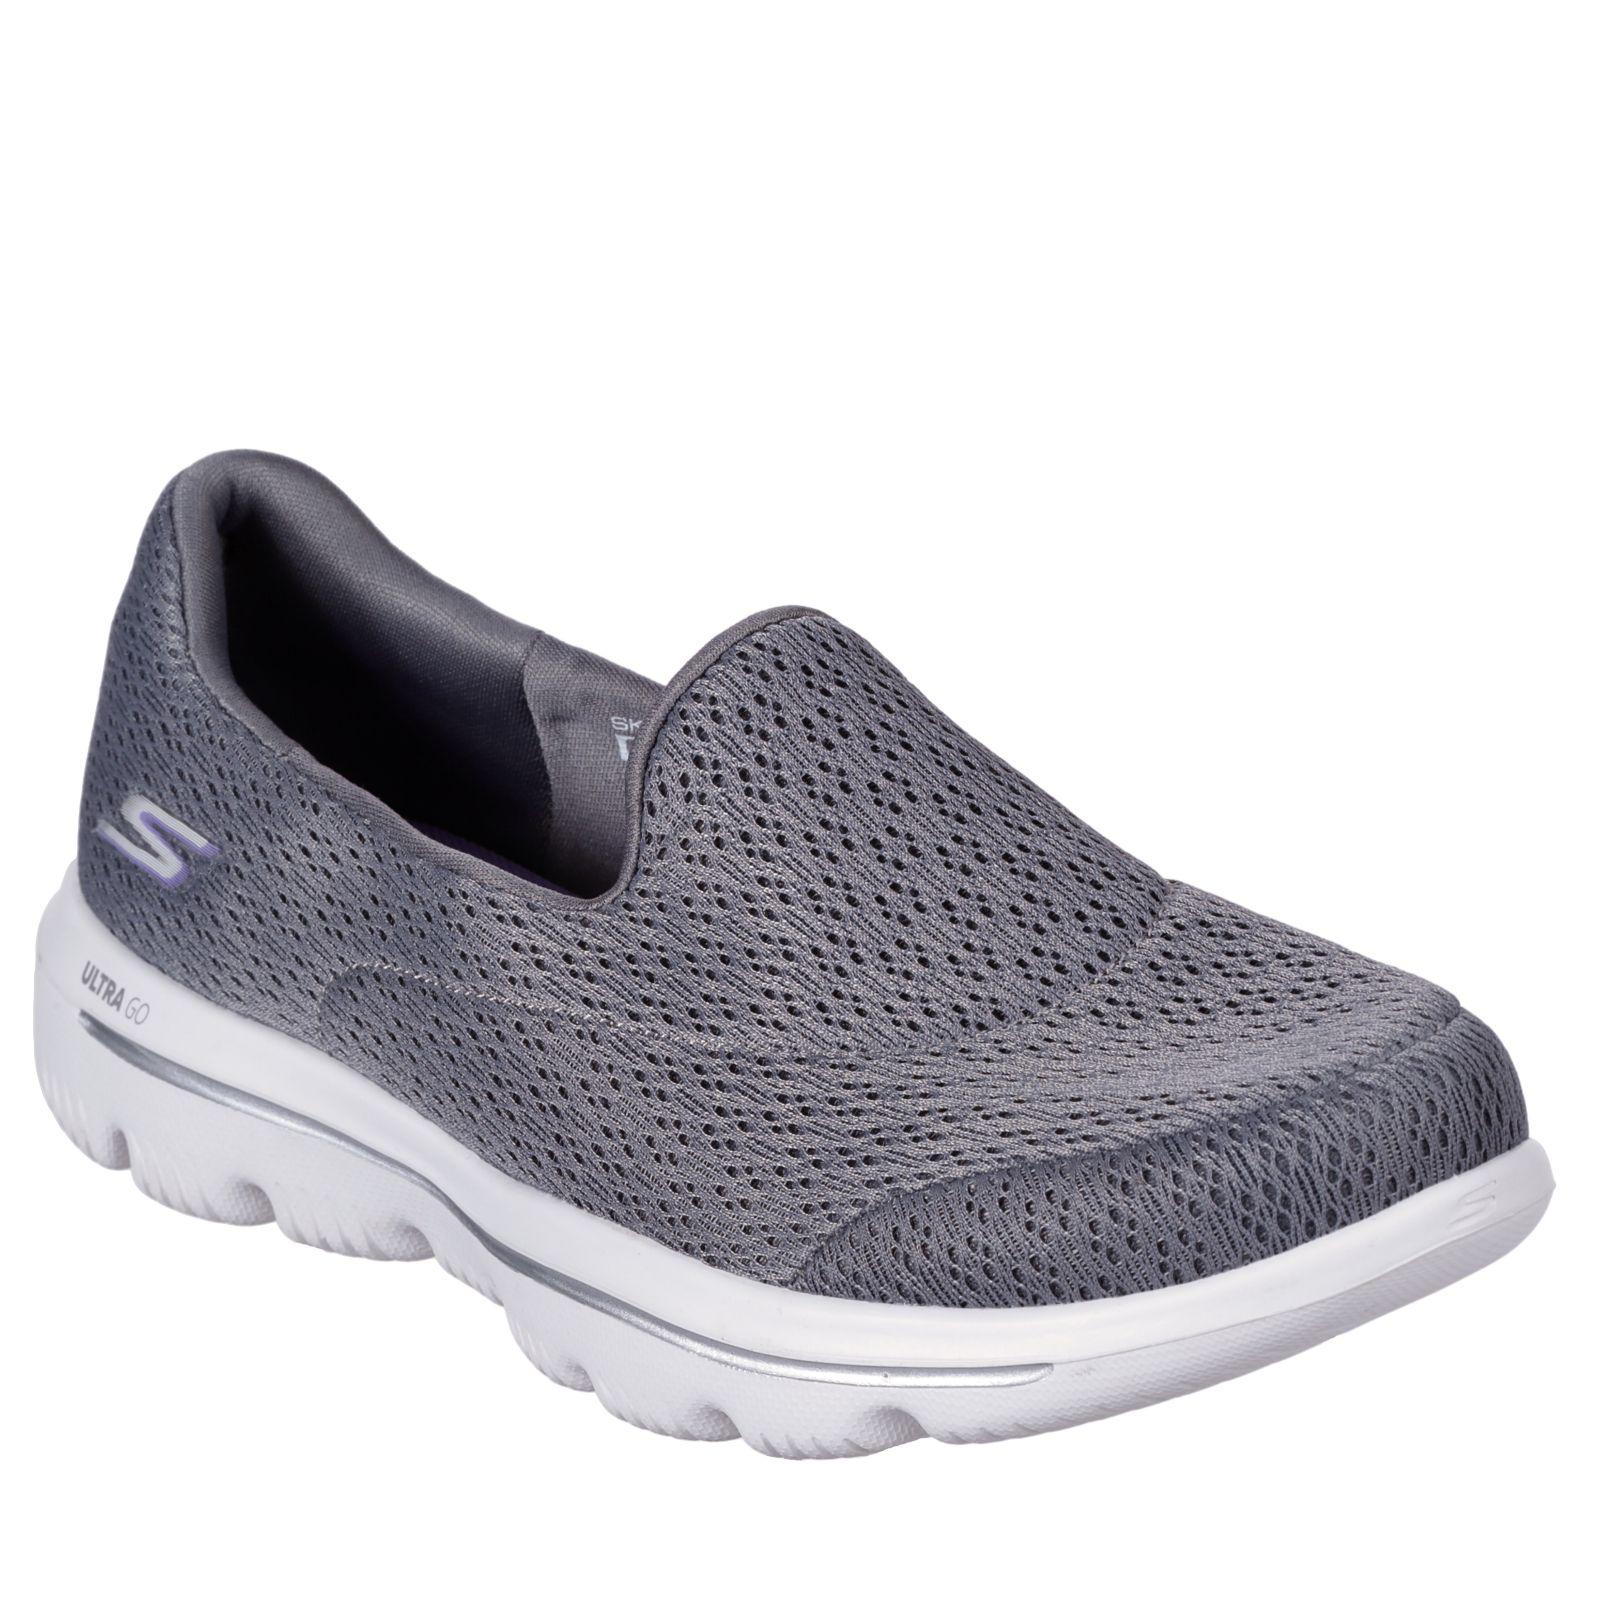 4aa37acf844f Skechers Go Walk Crochet Slip On Trainer - QVC UK